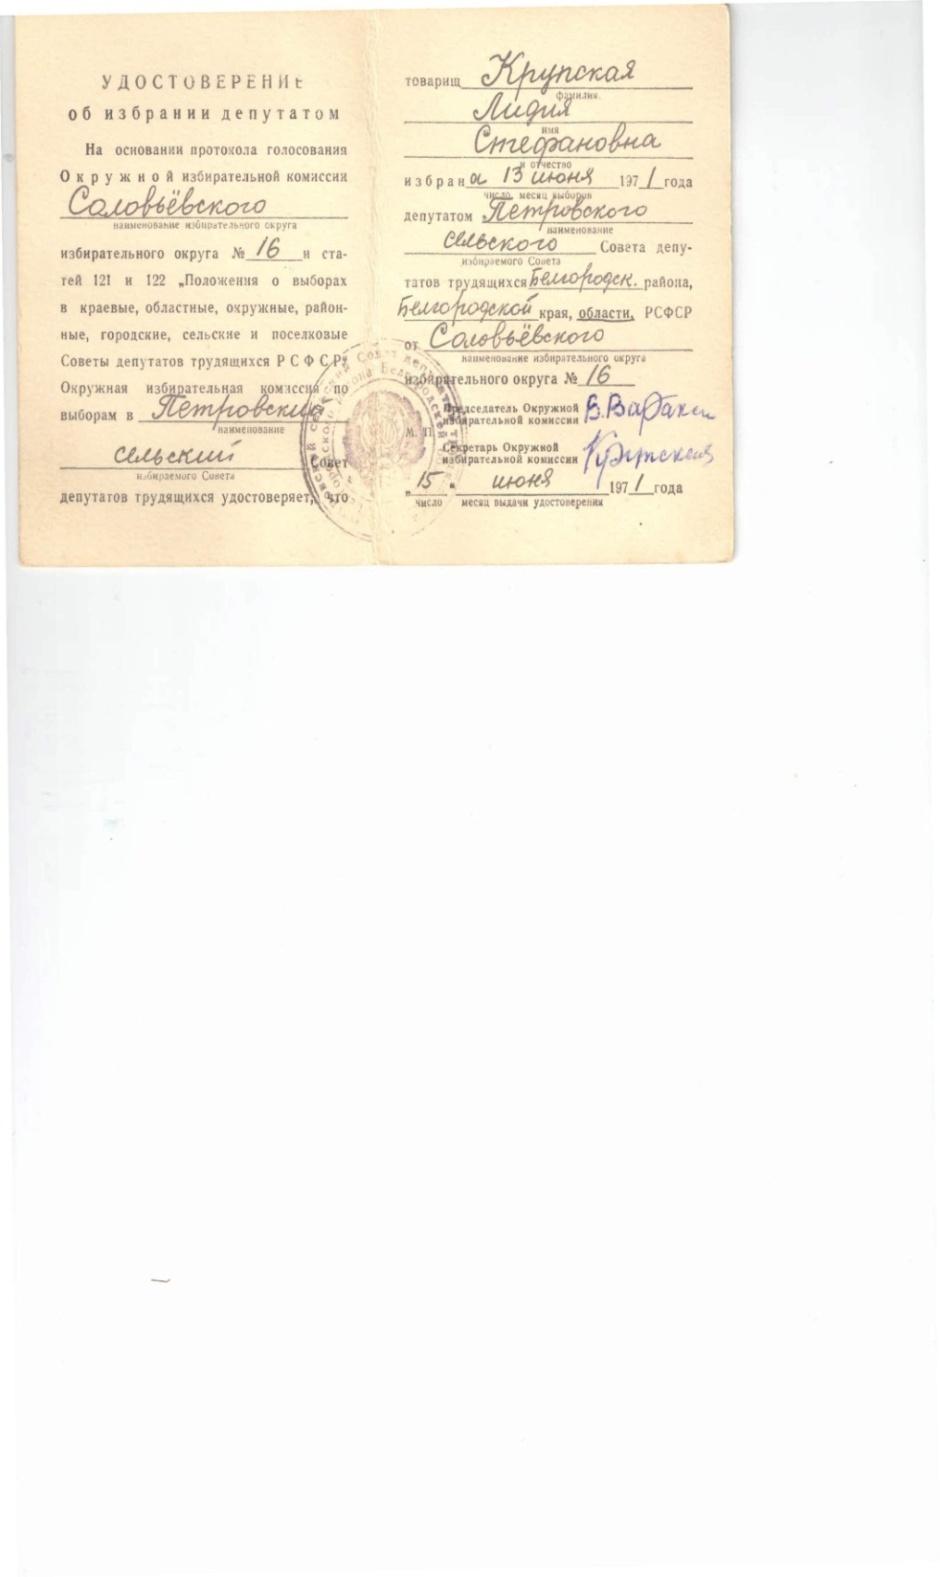 C:\Documents and Settings\Admin\Рабочий стол\Крупская Г.Н\Крупская Лидия Стефановна\14.jpg